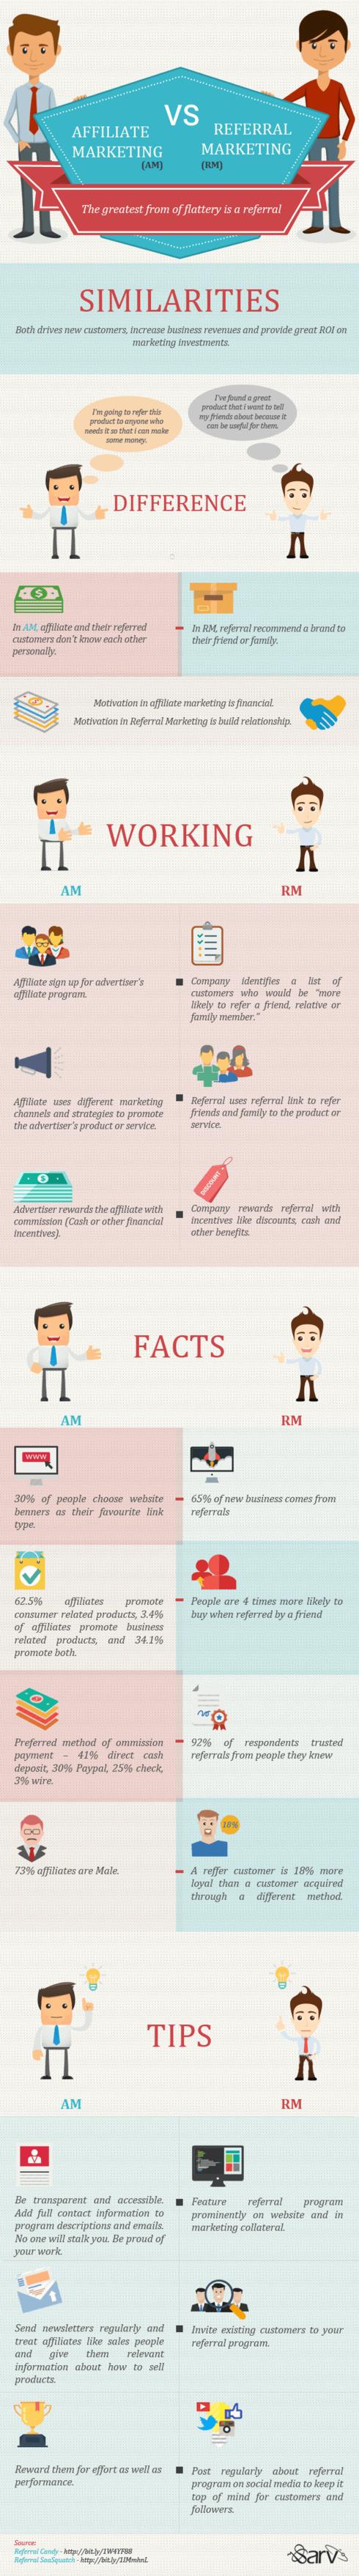 Affiliate and Referral Marketing Comparison via Pawan Kumar